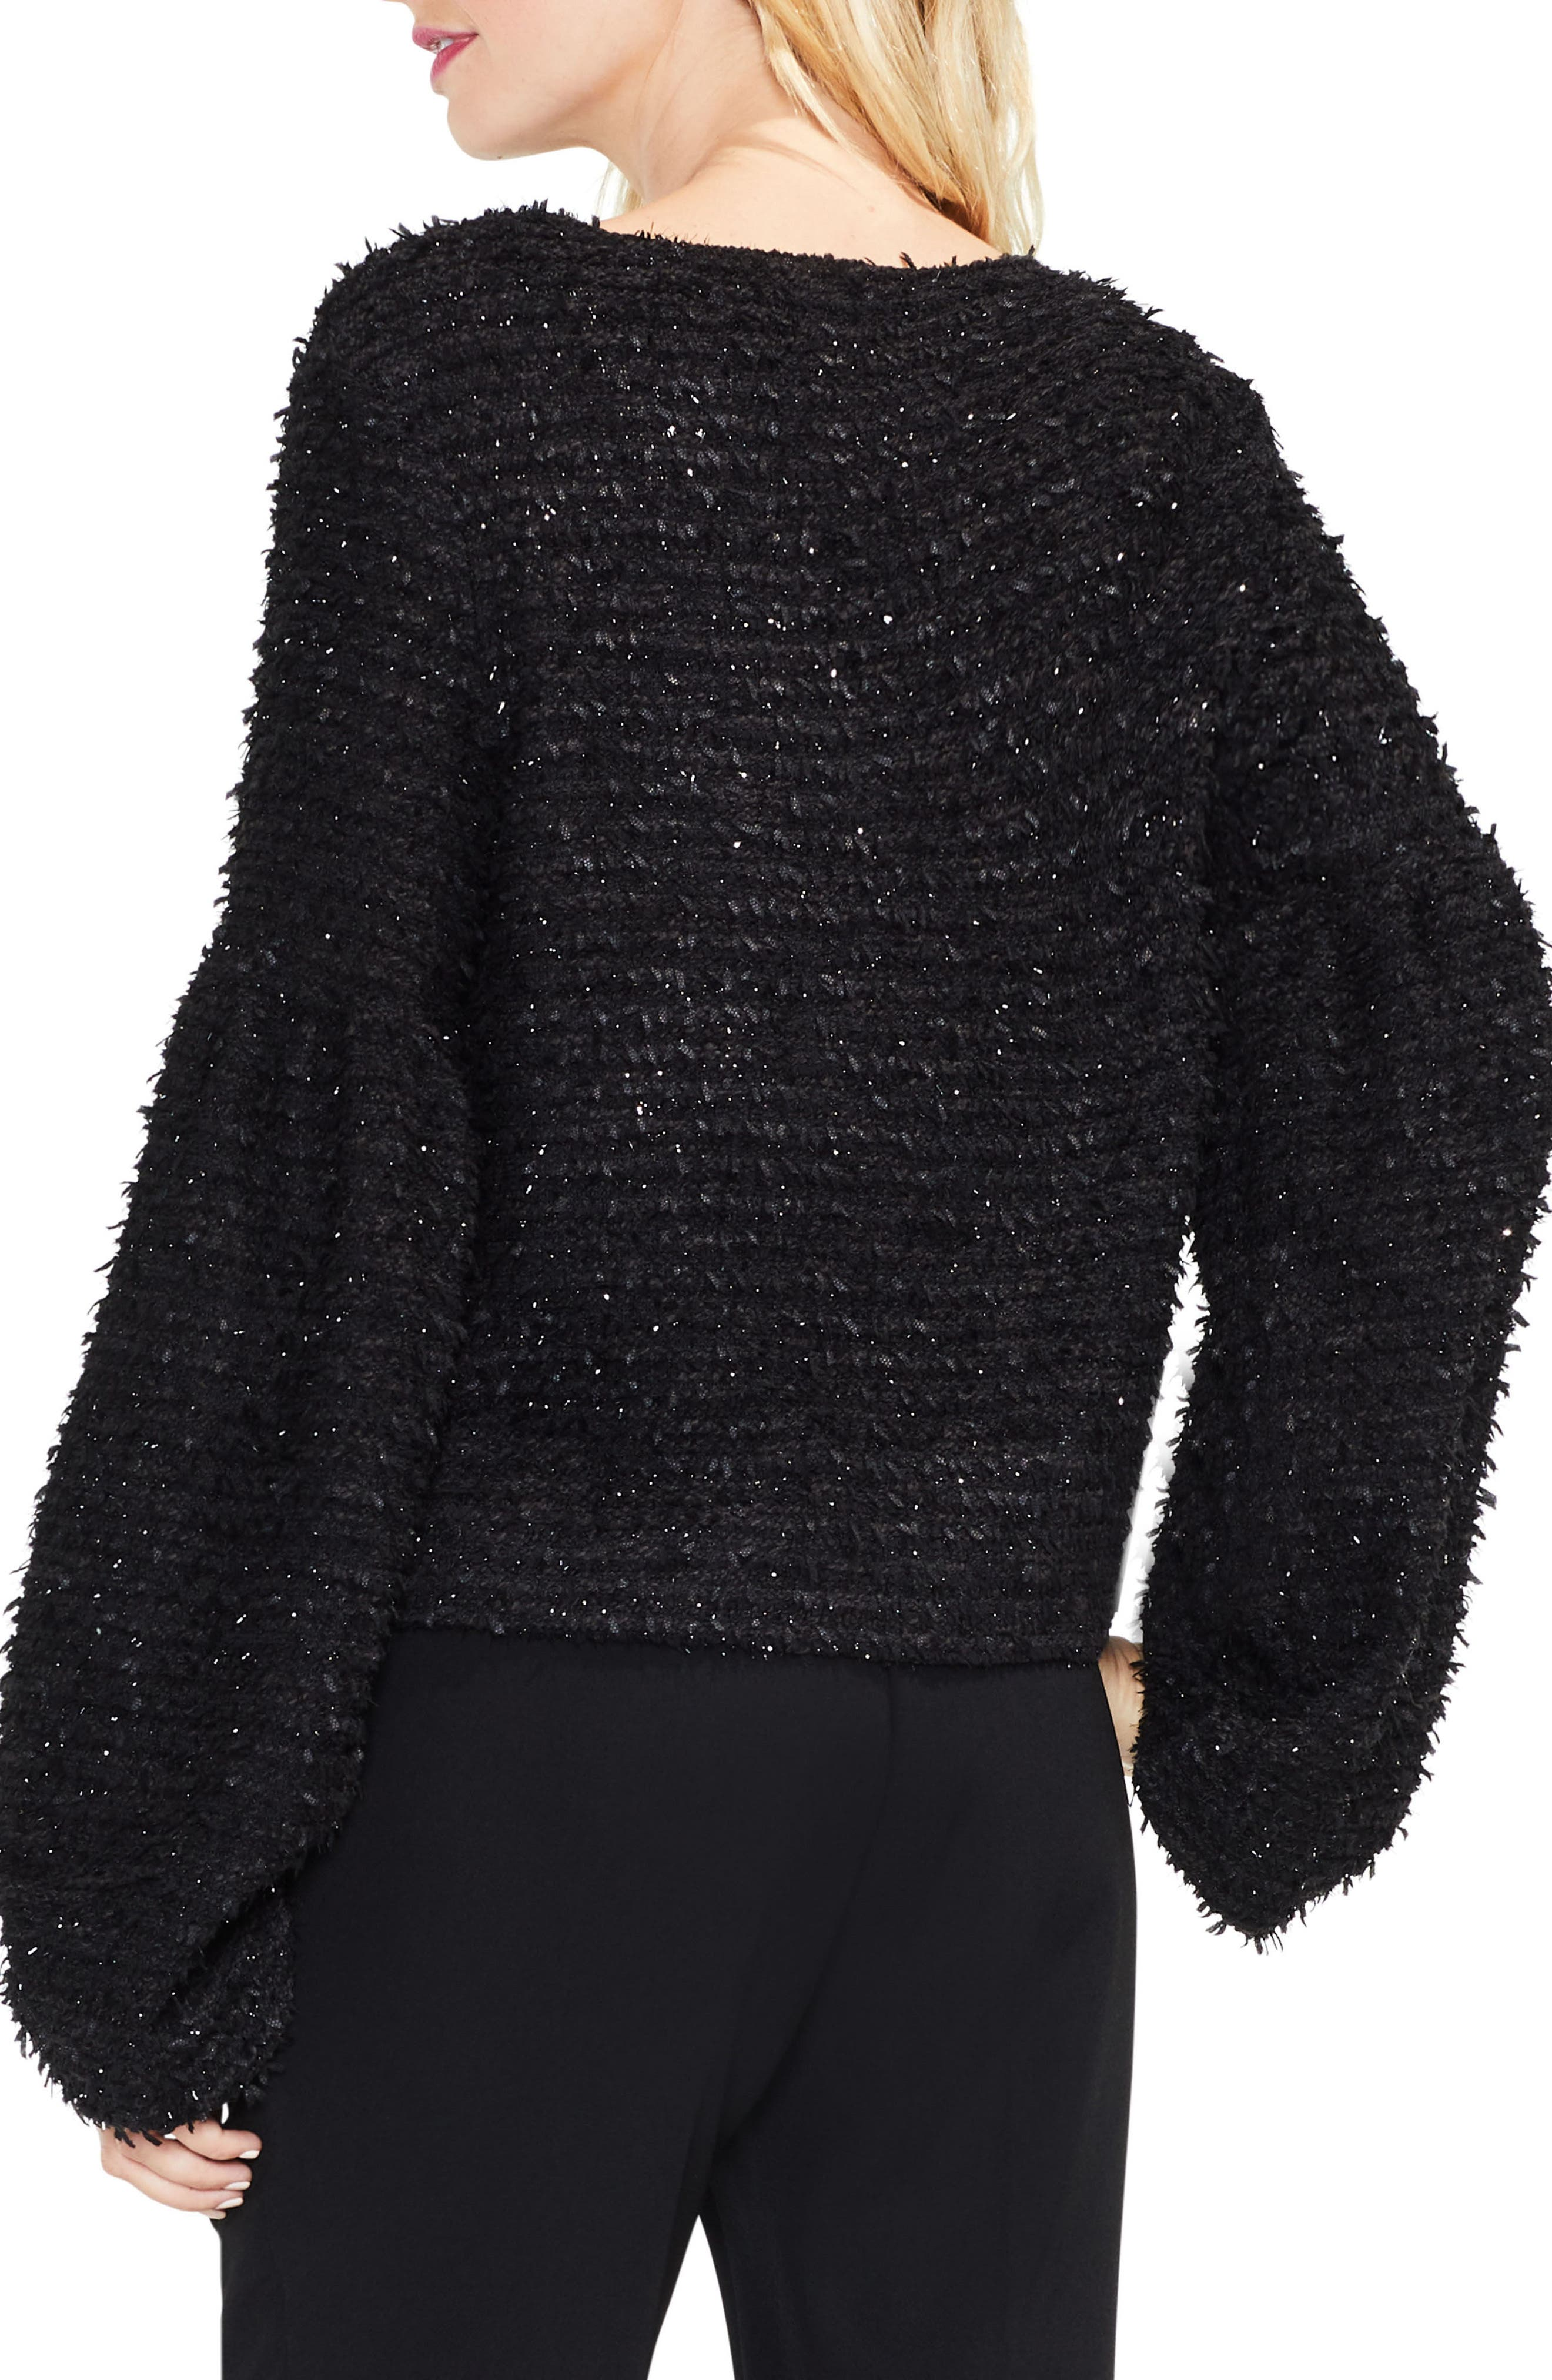 Bubble Sleeve Eyelash Knit Sweater,                             Alternate thumbnail 2, color,                             Rich Black